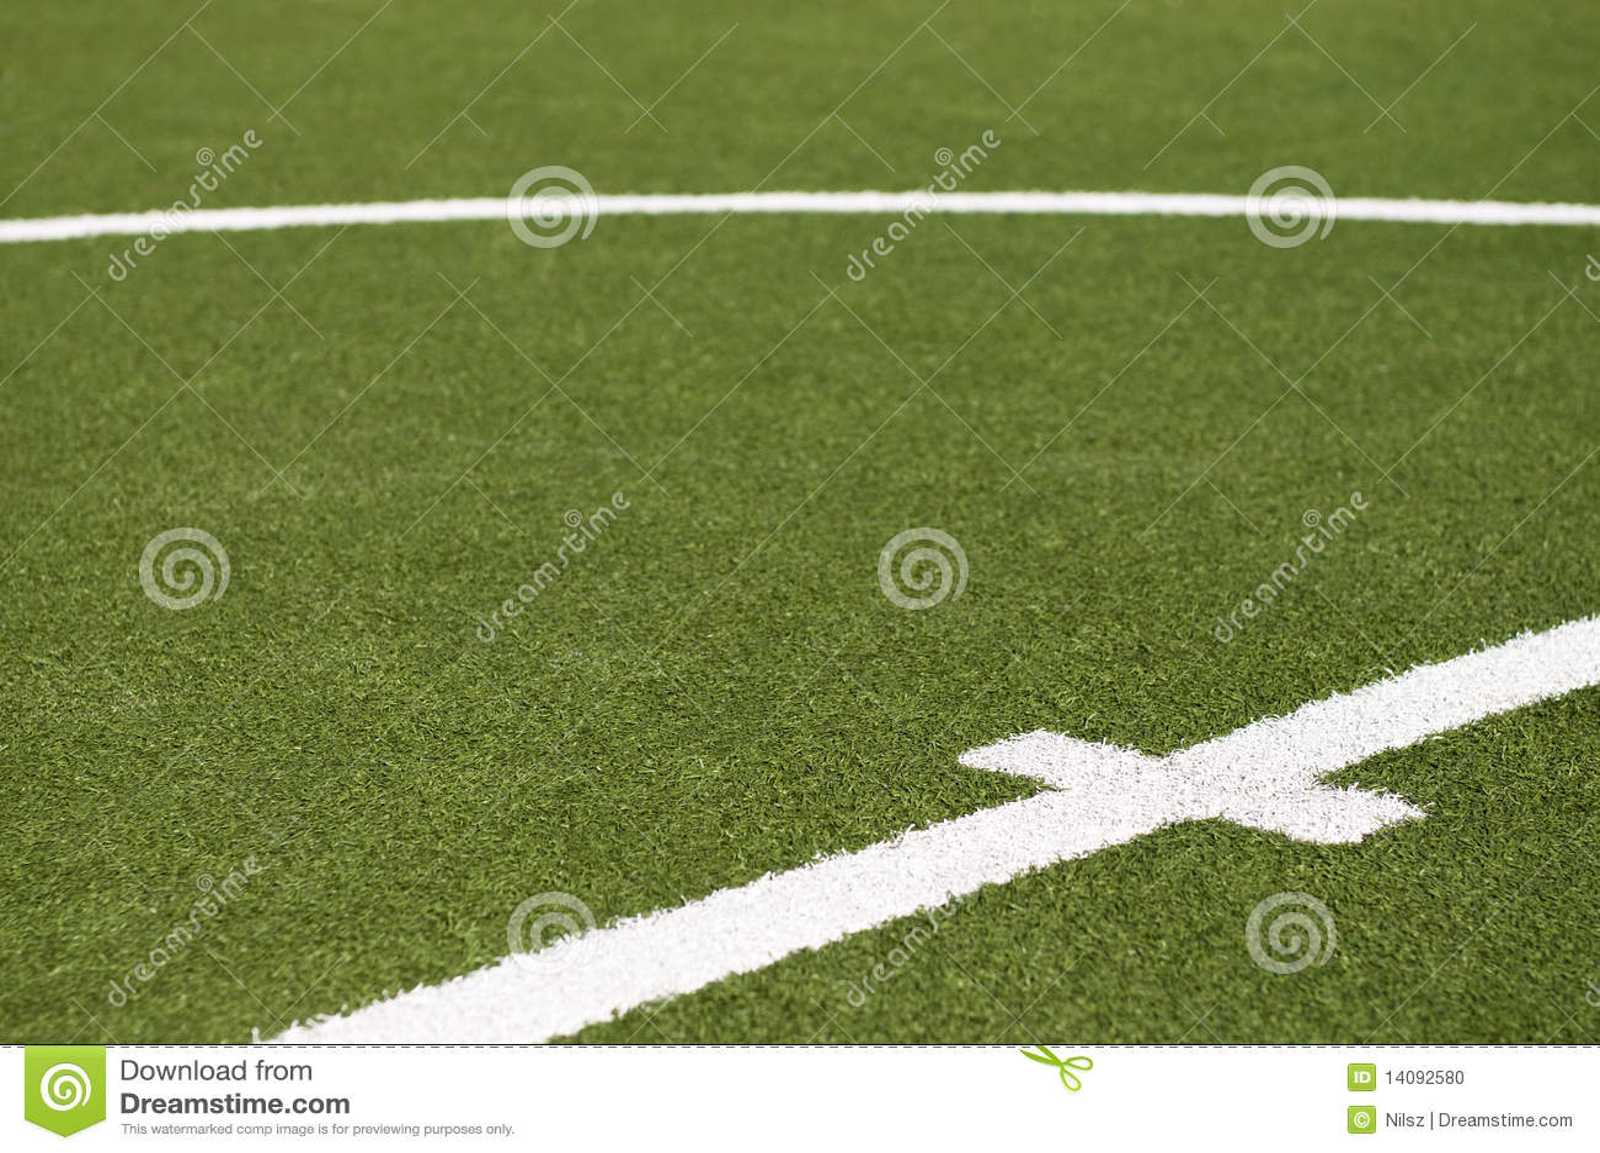 Goal kick line on soccer field stock photo image 14092580